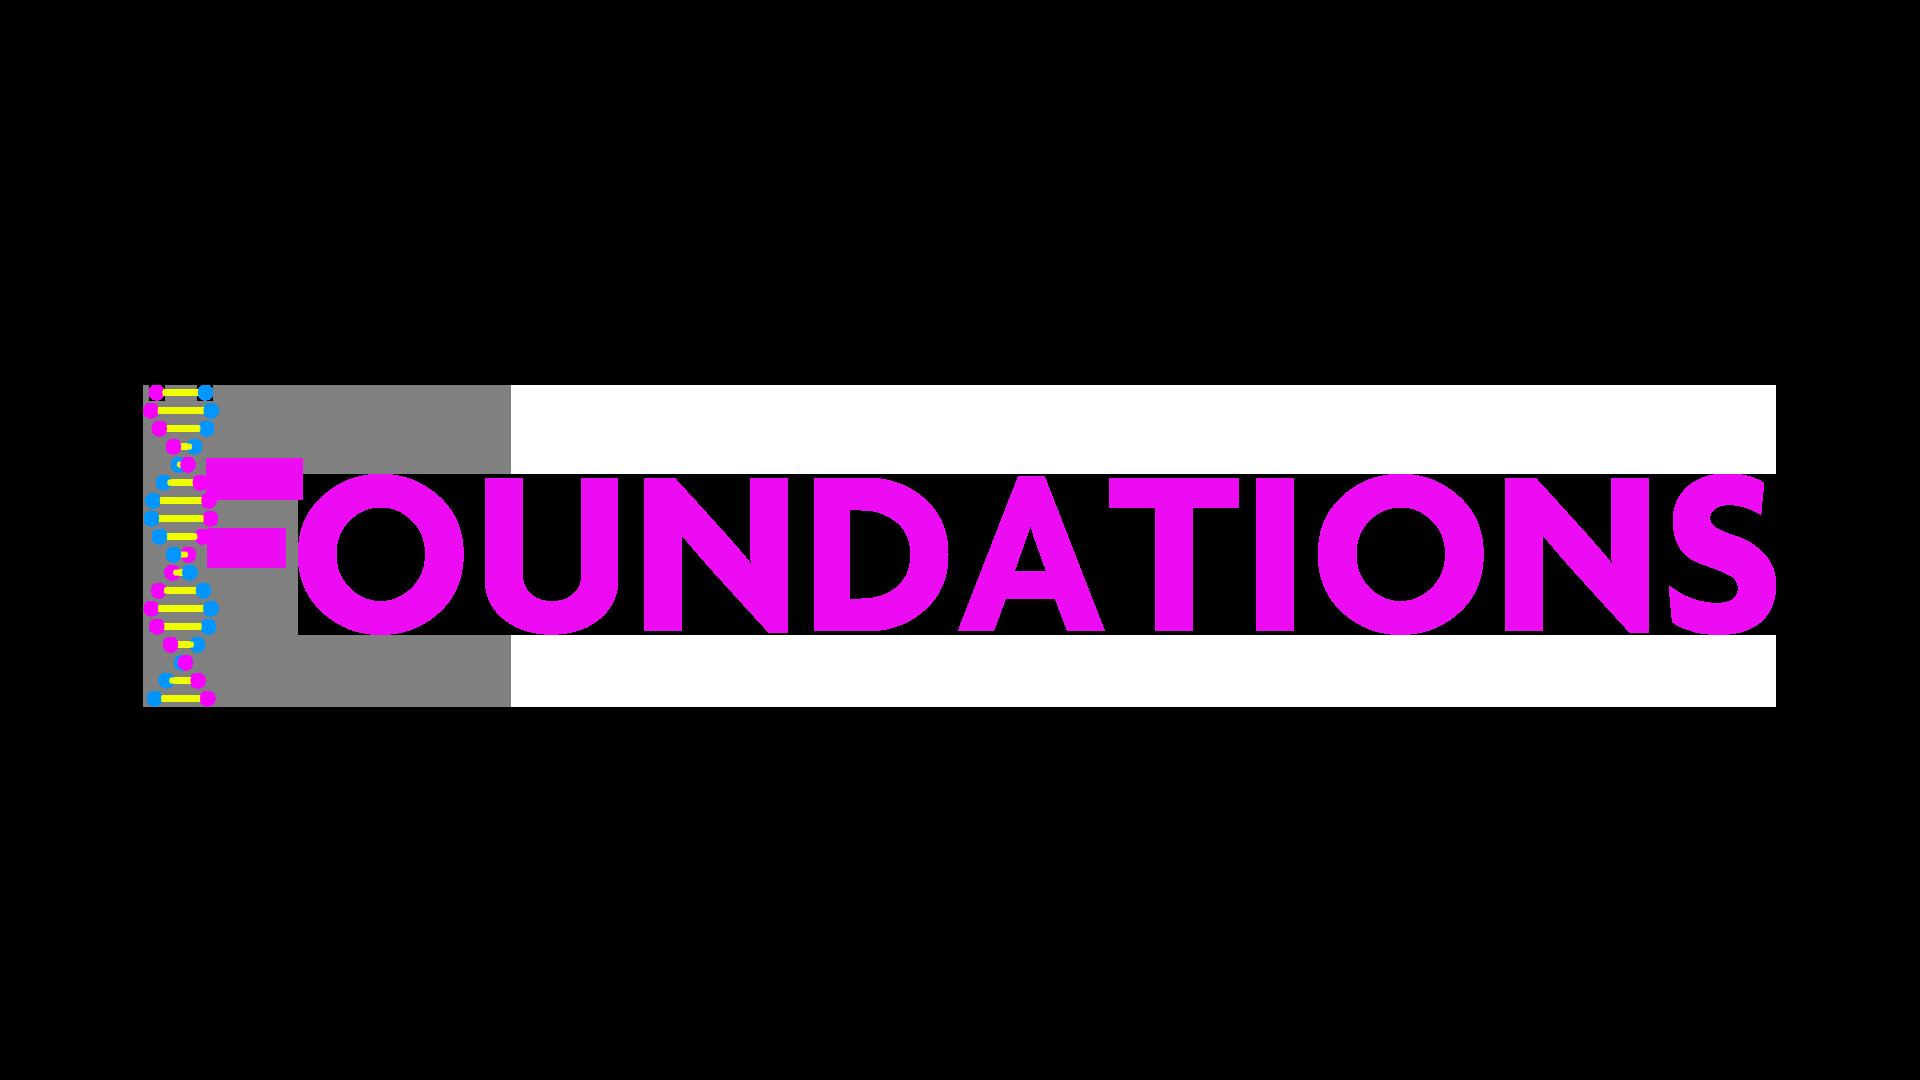 foundations lockup.png